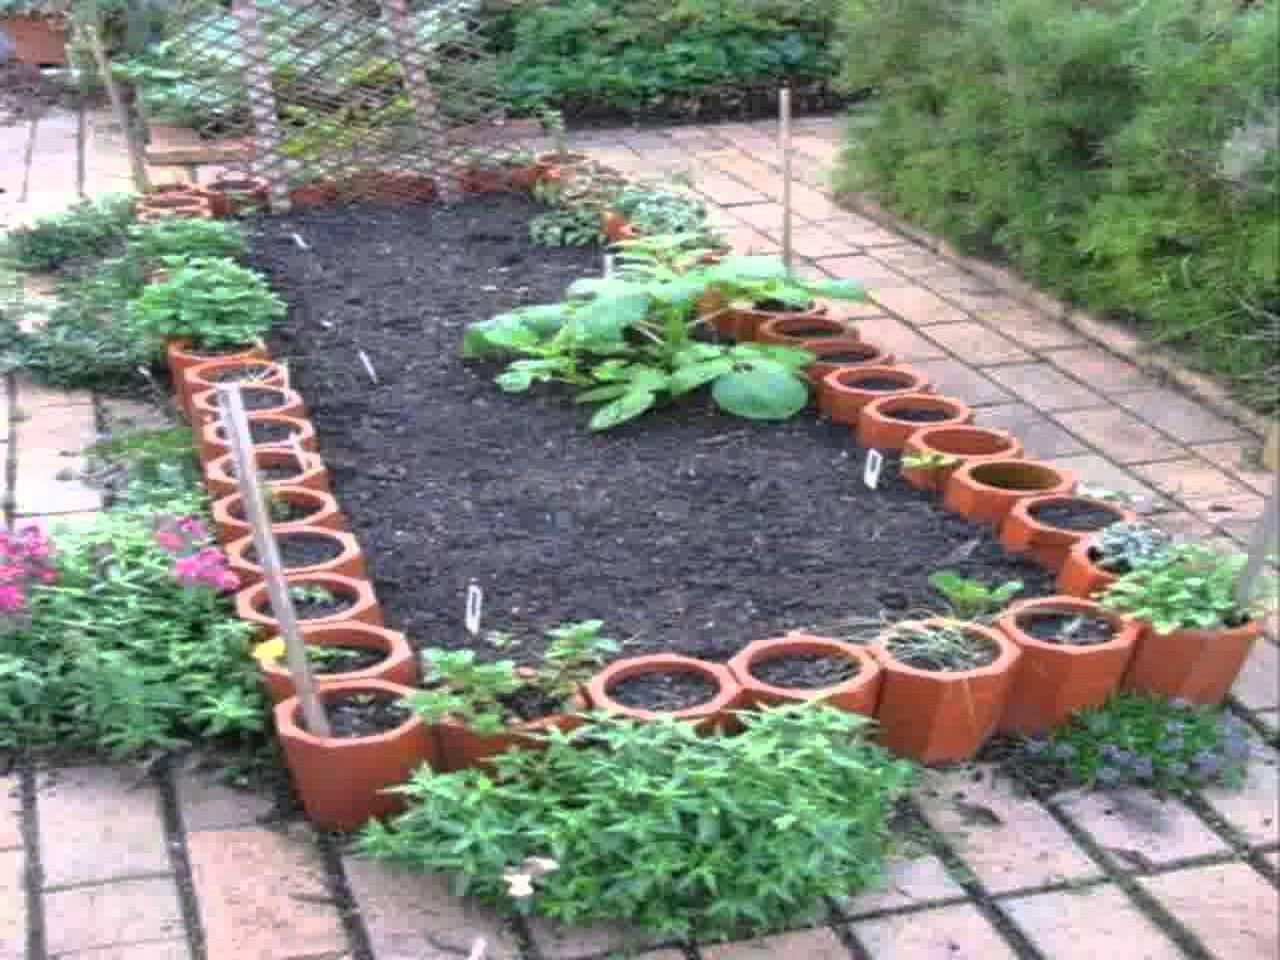 Best ideas about Home Vegetable Garden Ideas . Save or Pin Small Home Ve able Garden Ideas Garden Trends Now.